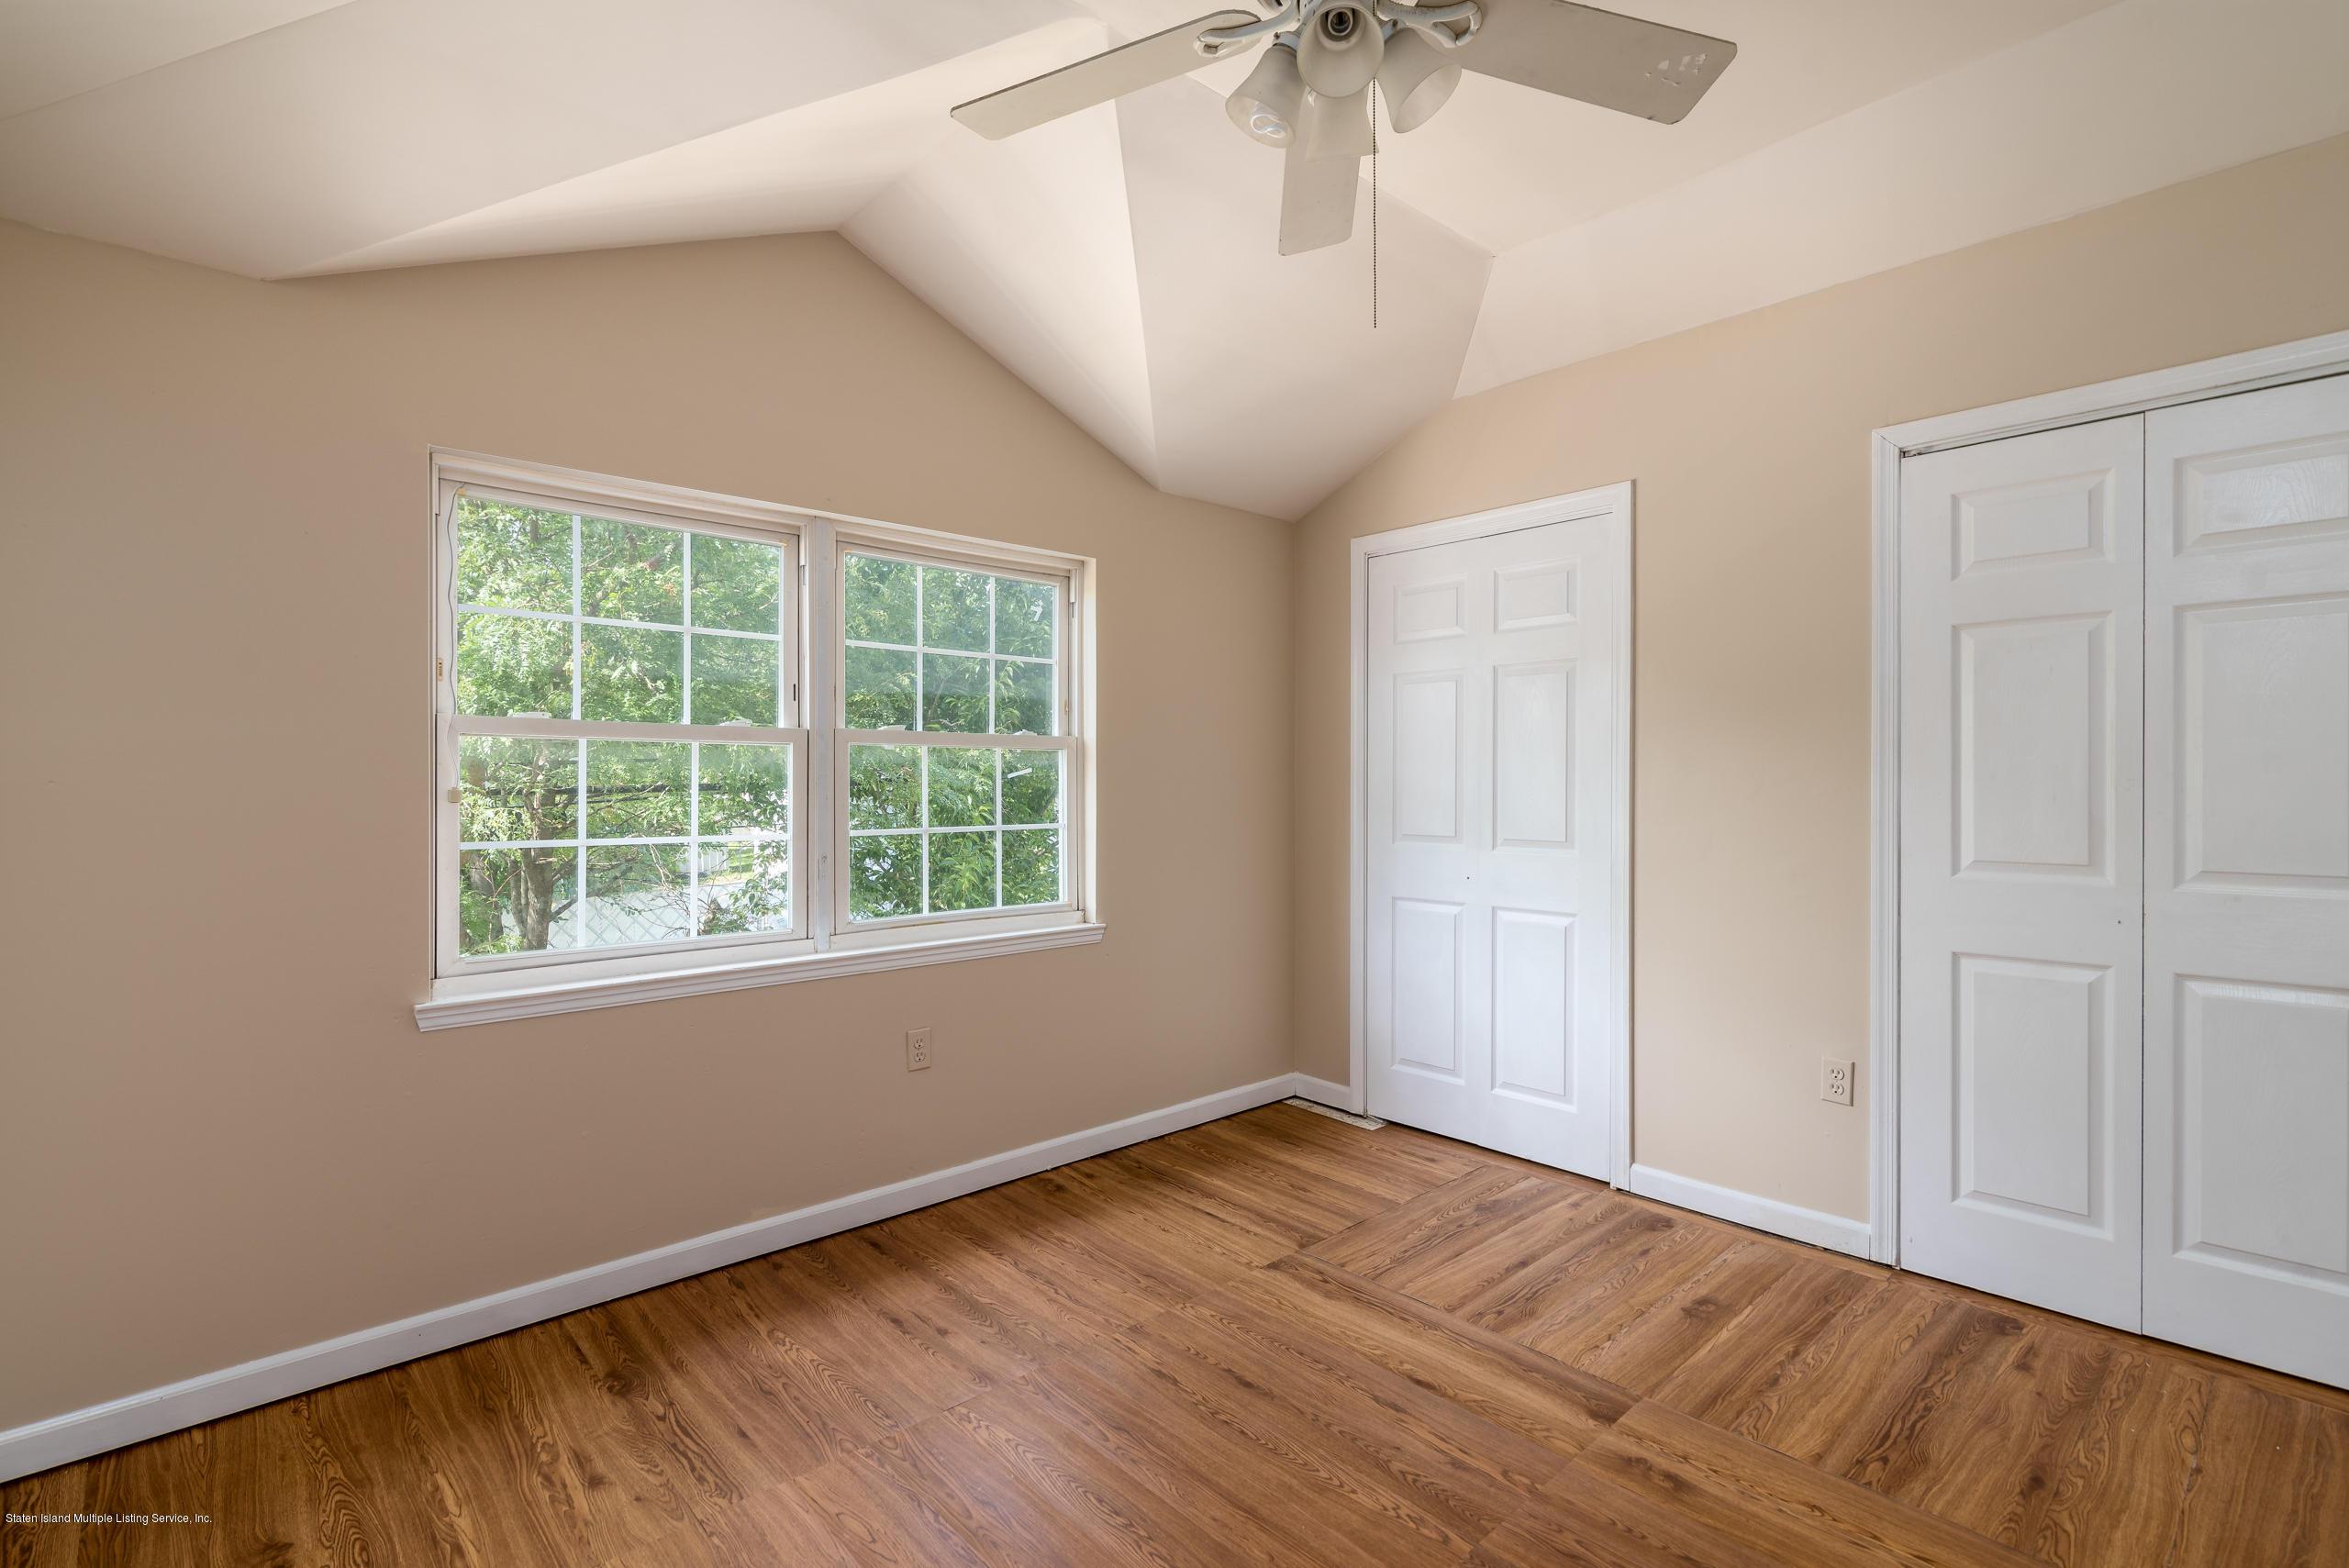 Single Family - Semi-Attached 230 Holden Boulevard  Staten Island, NY 10314, MLS-1130208-9